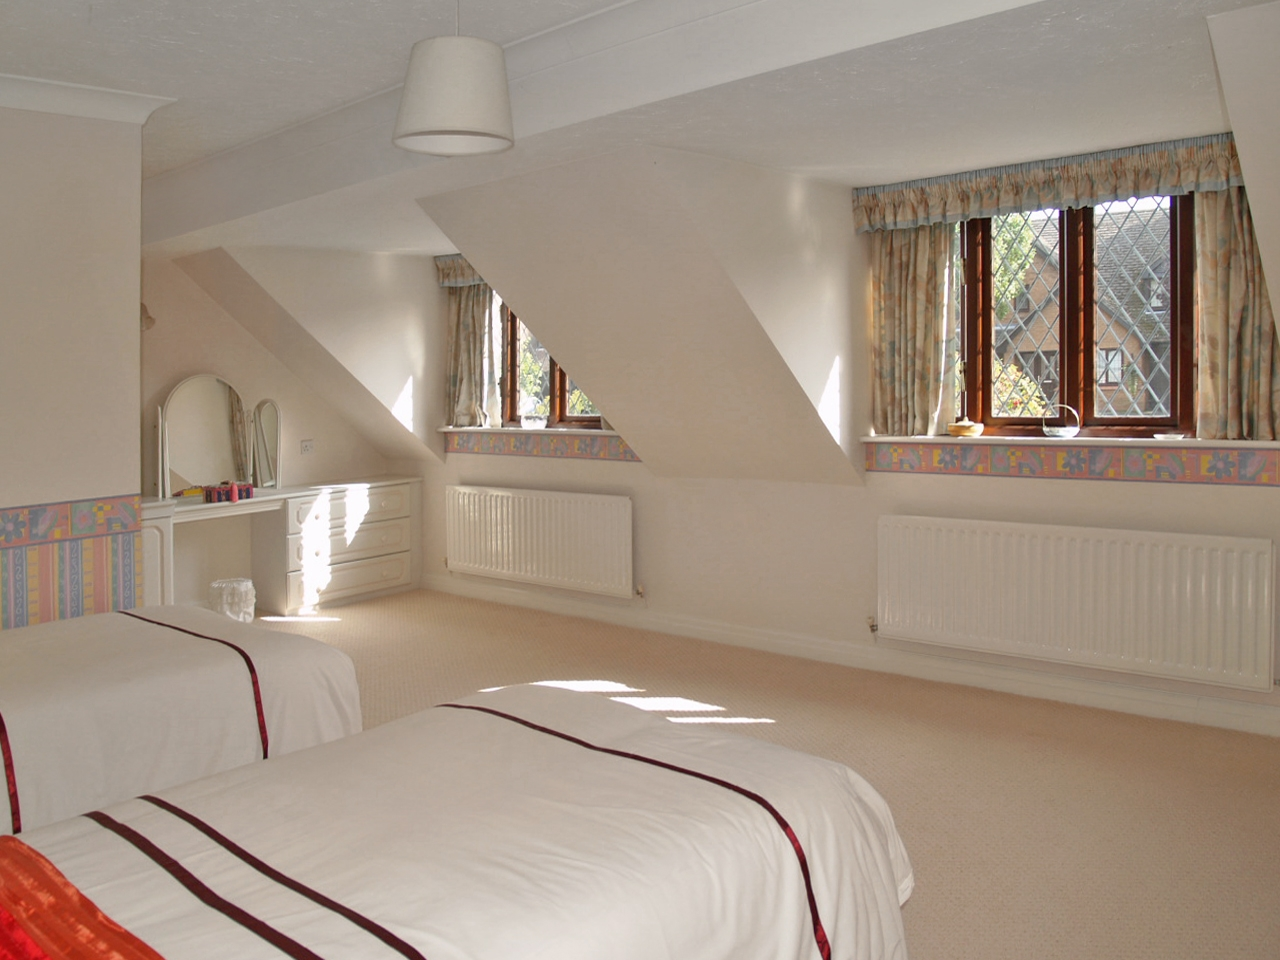 4 bedroom detached house SSTC in Birmingham - photograph 11.